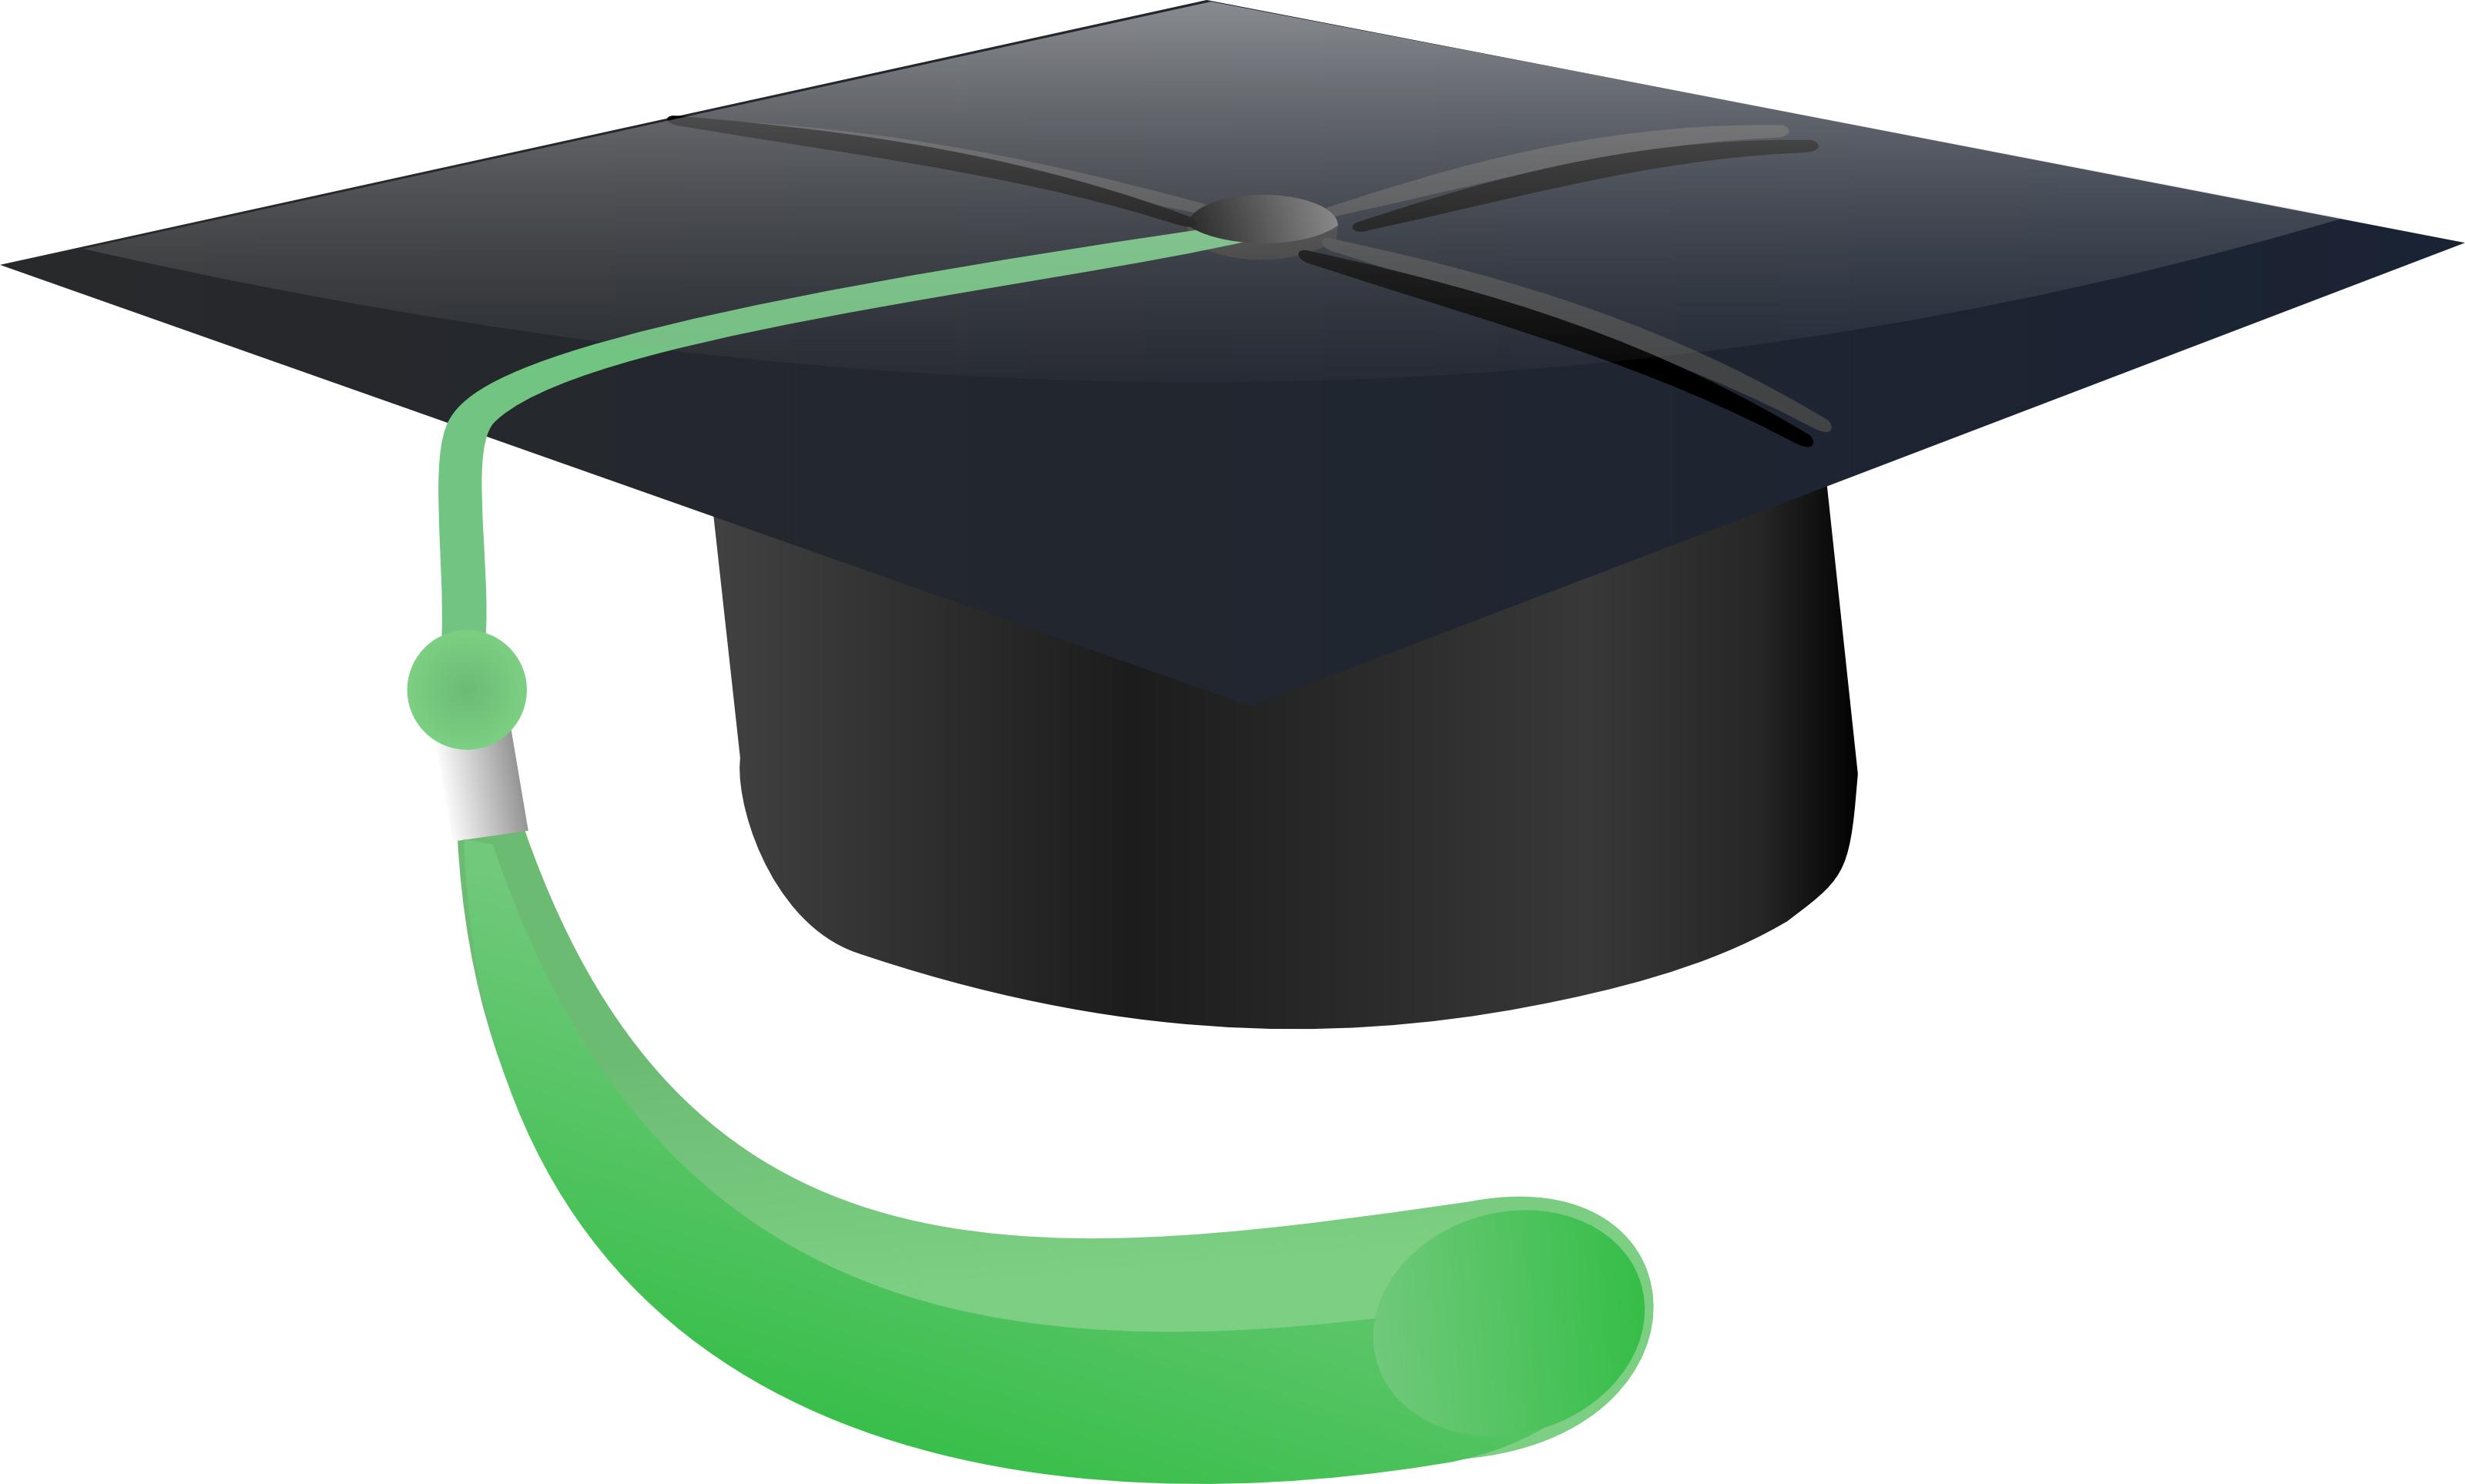 Graduation Cap Clipart Graduation Hat Ve-Graduation cap clipart graduation hat vector clipartall-8